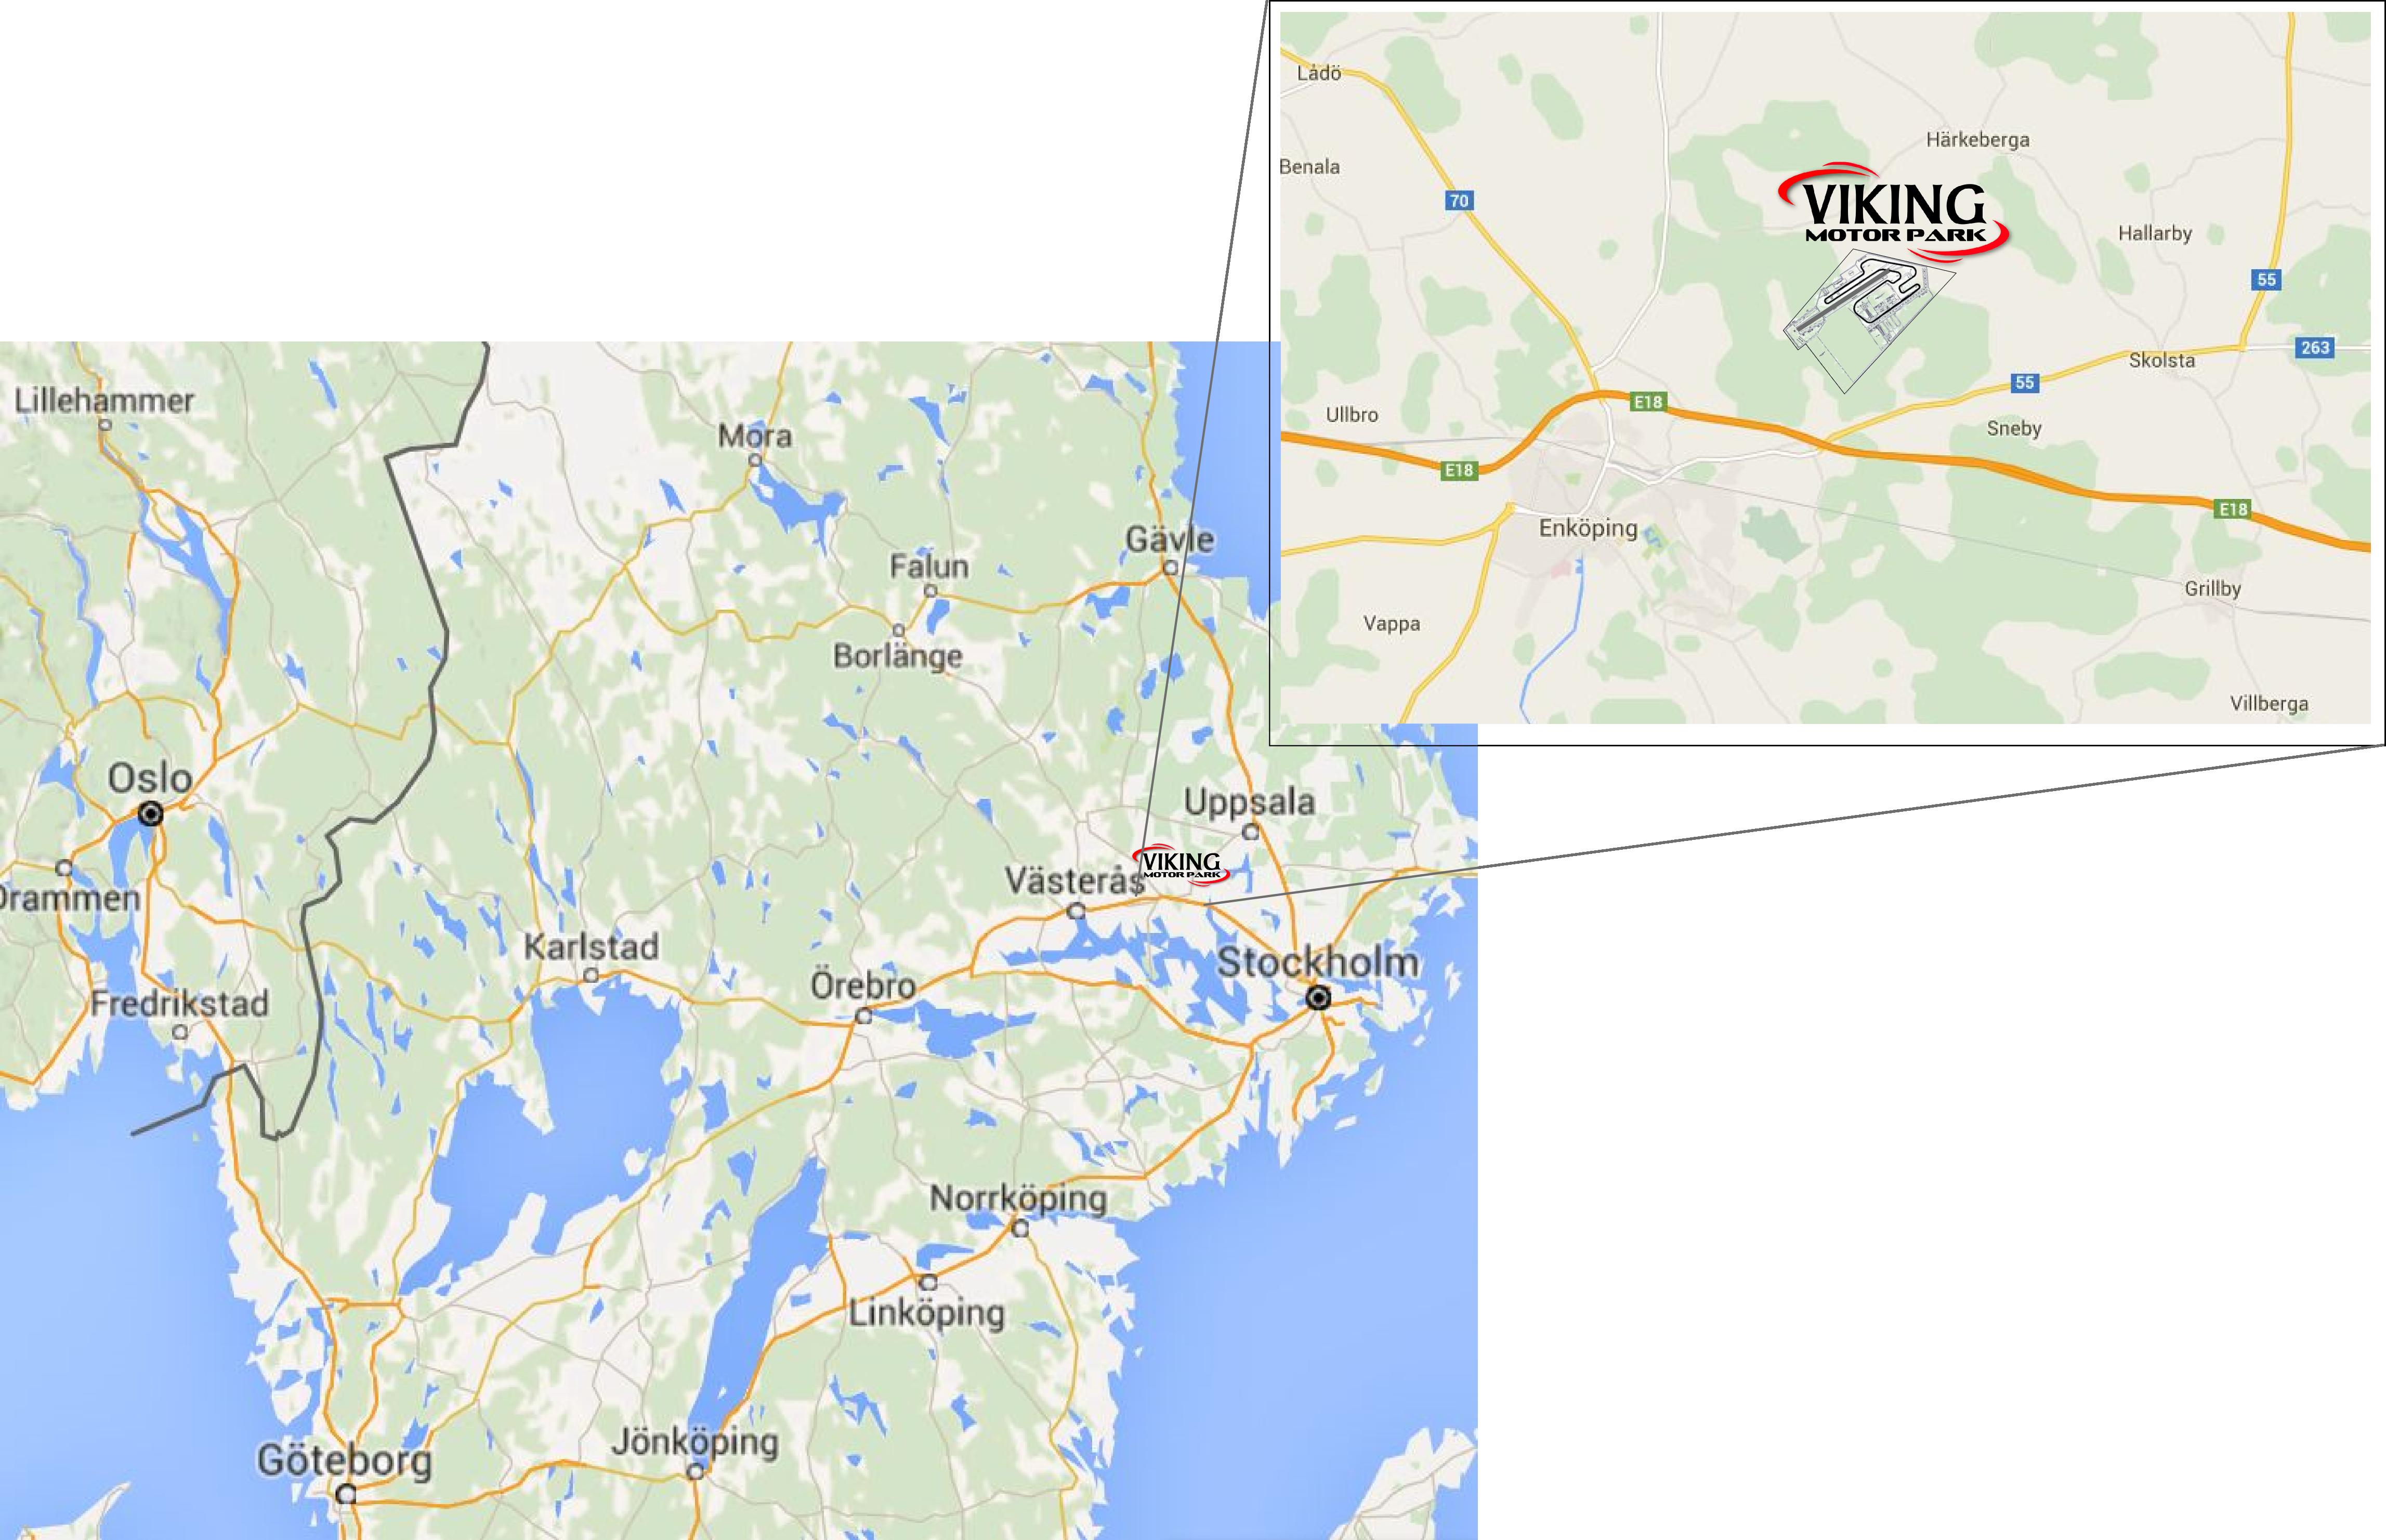 karta - enköping - viking motorpark